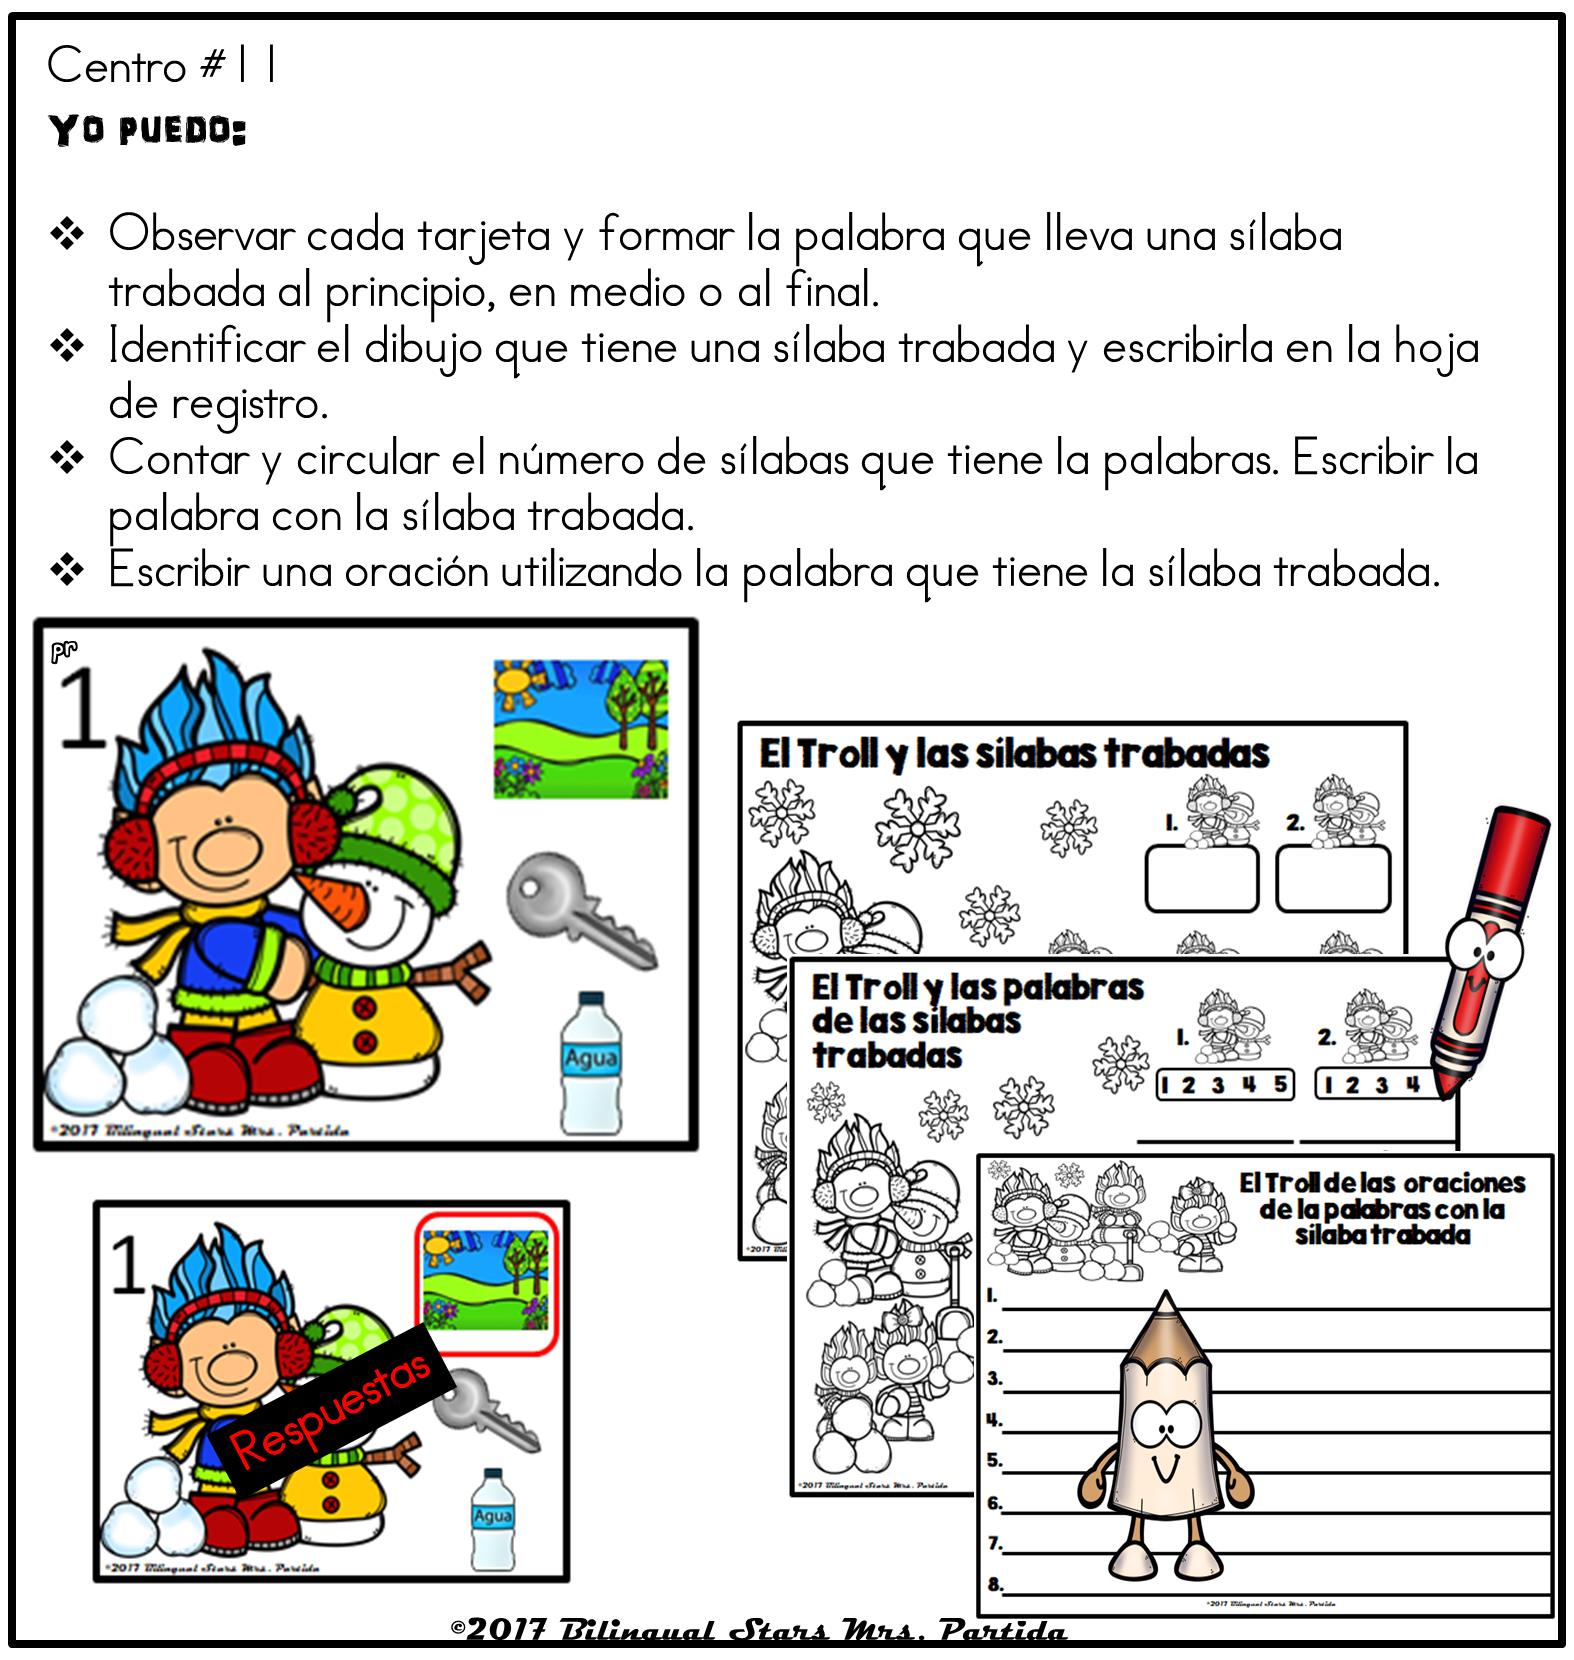 Pin By Bilingual Stars Mrs. Partida On Sílabas Trabadas